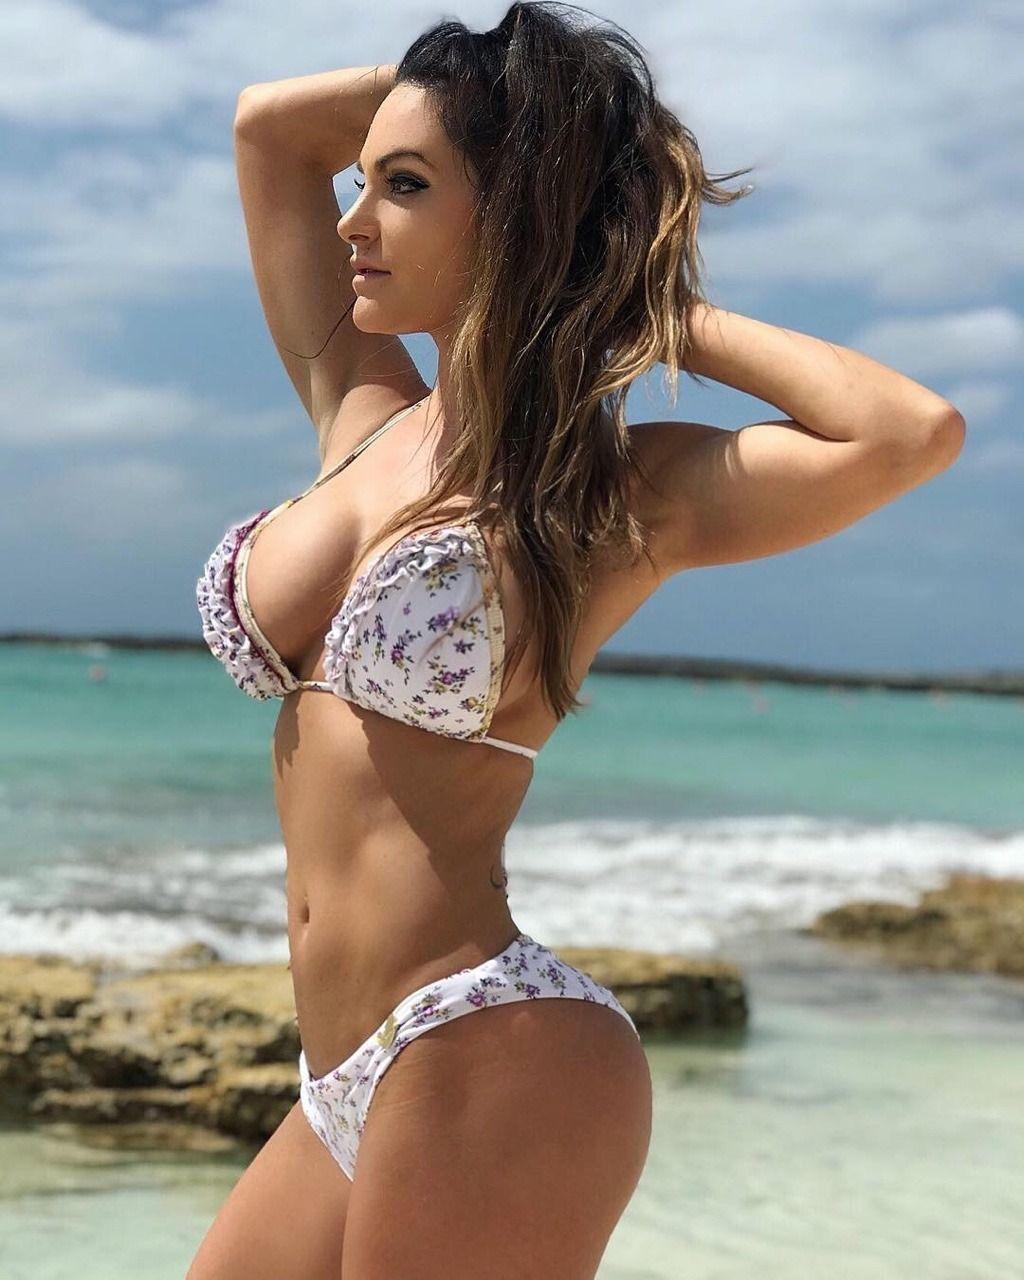 b9feec194 The Gym Babe | mamis!! | Chicas en bikini, Mujeres más sexys y ...